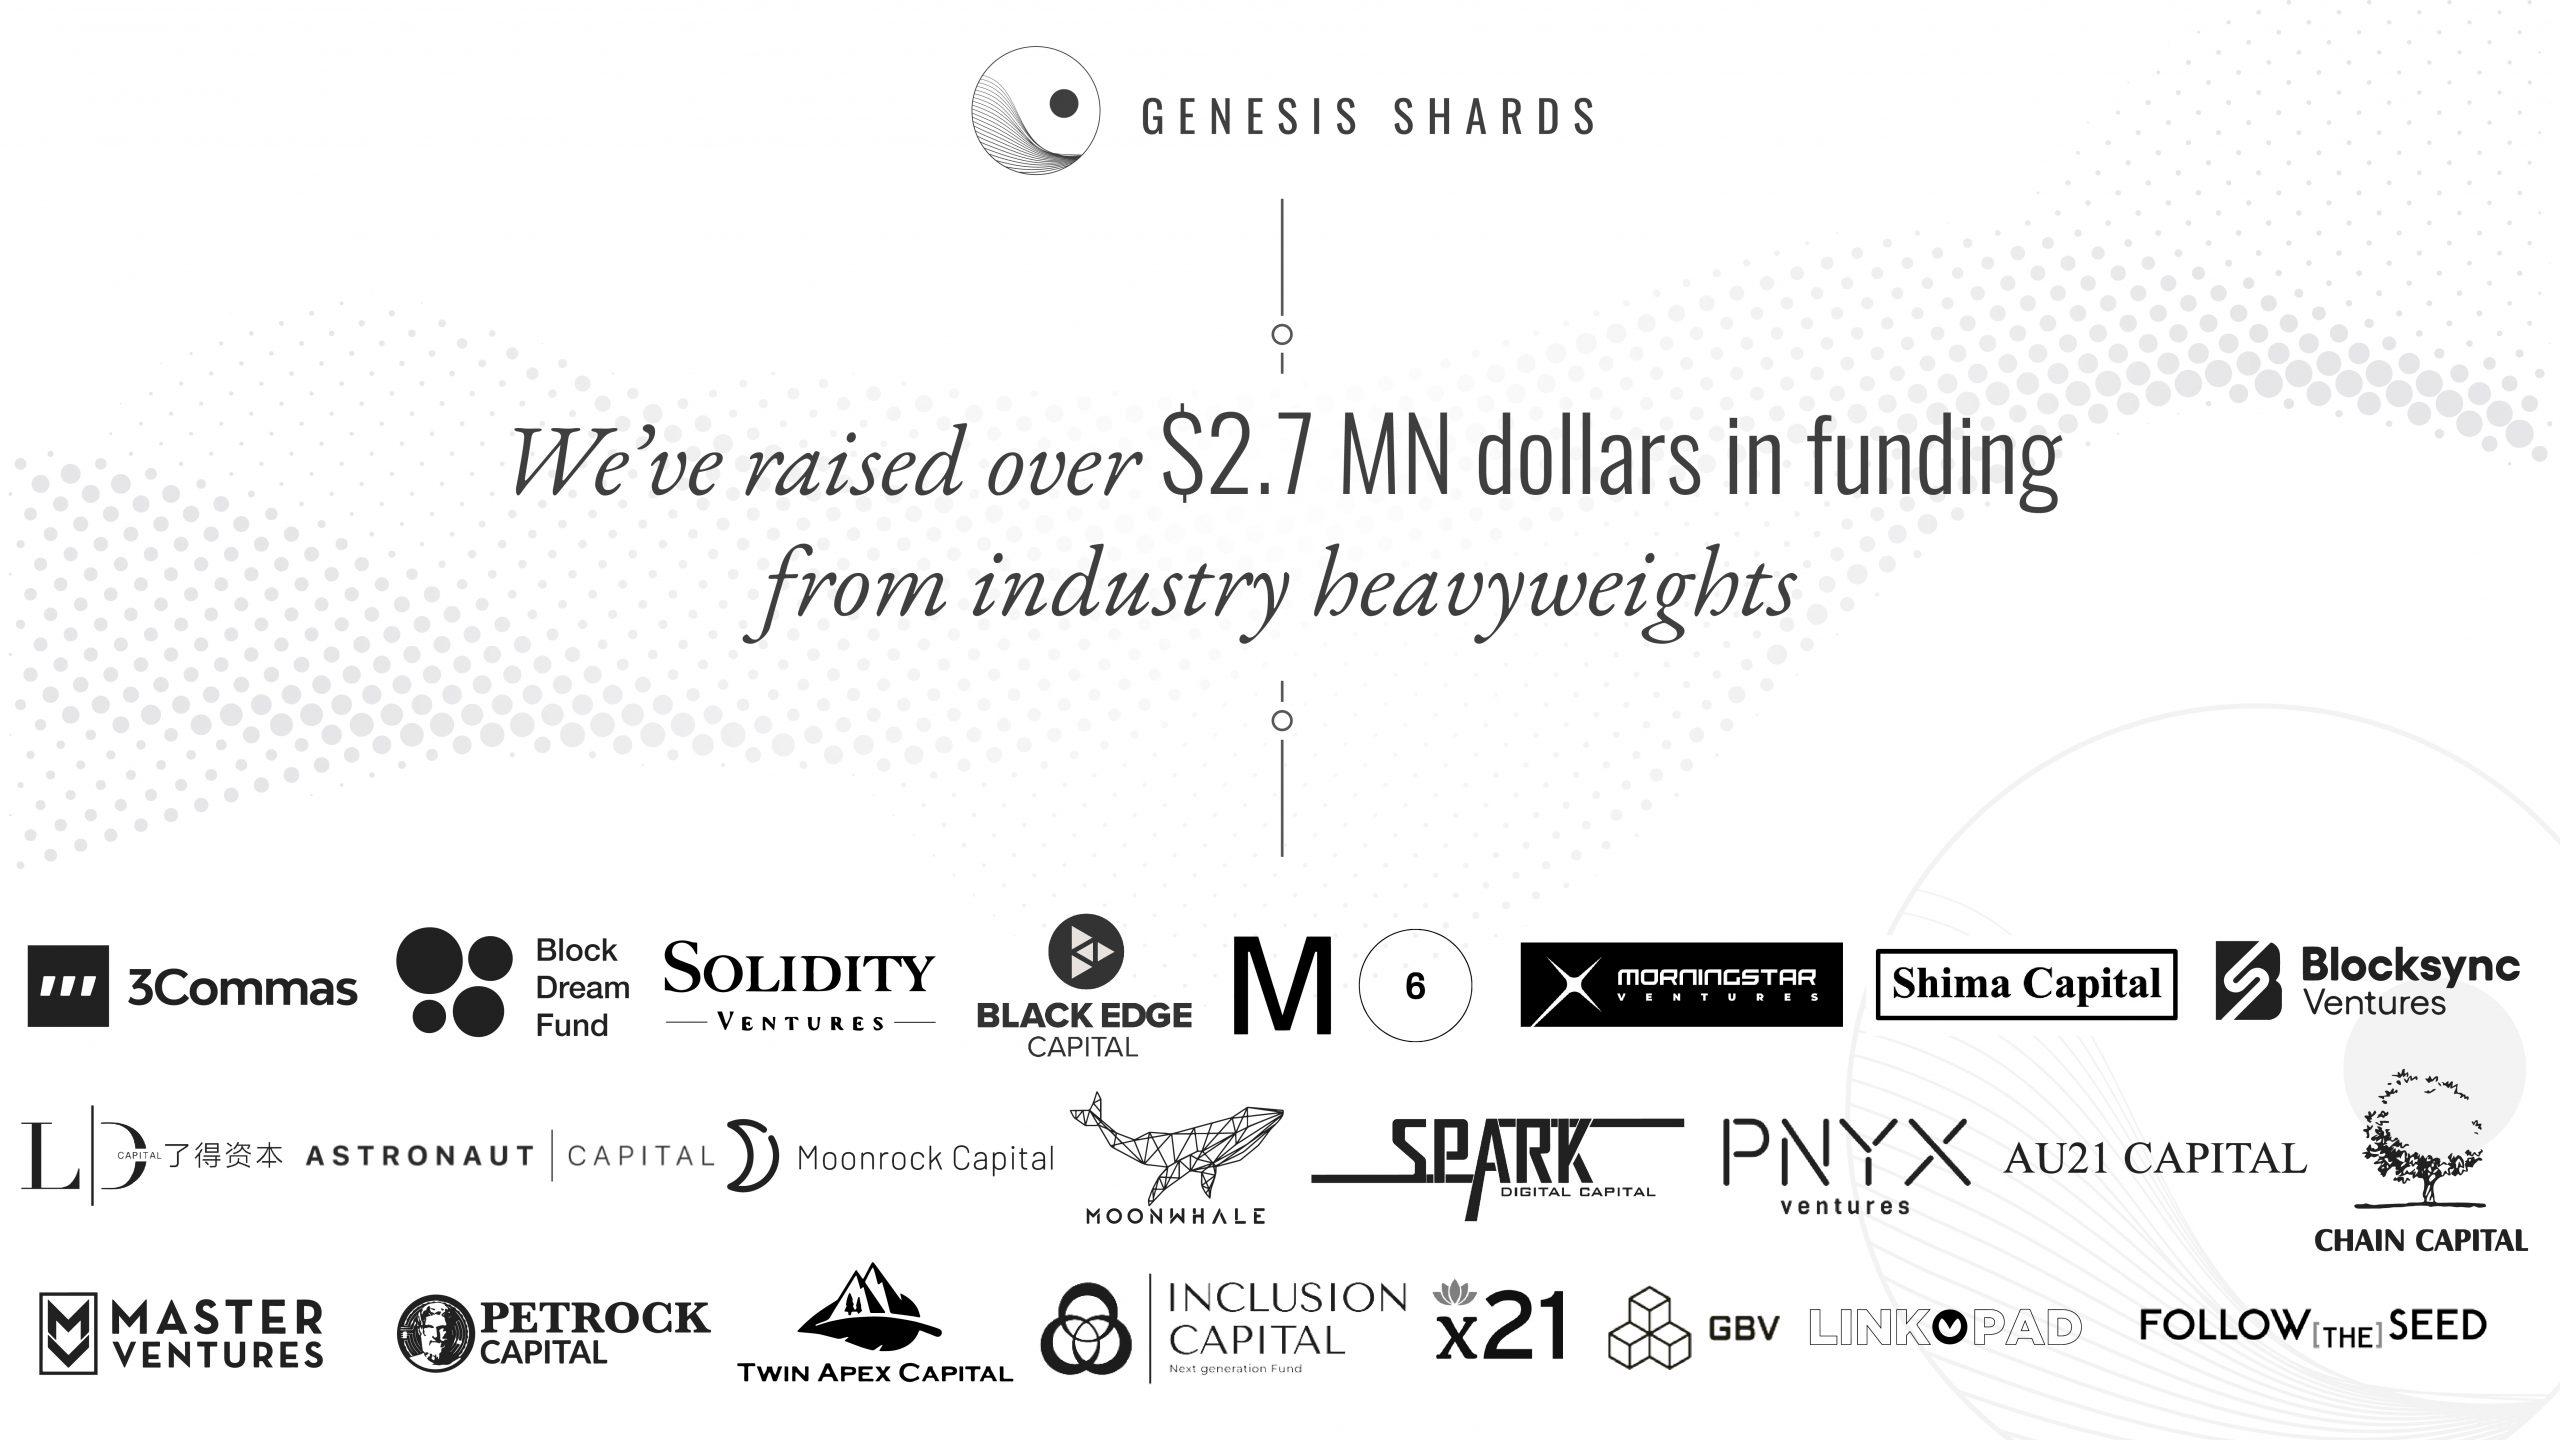 Genesis Shards raises $2.7M to create new Pre-IDO market using DeFi NFT options